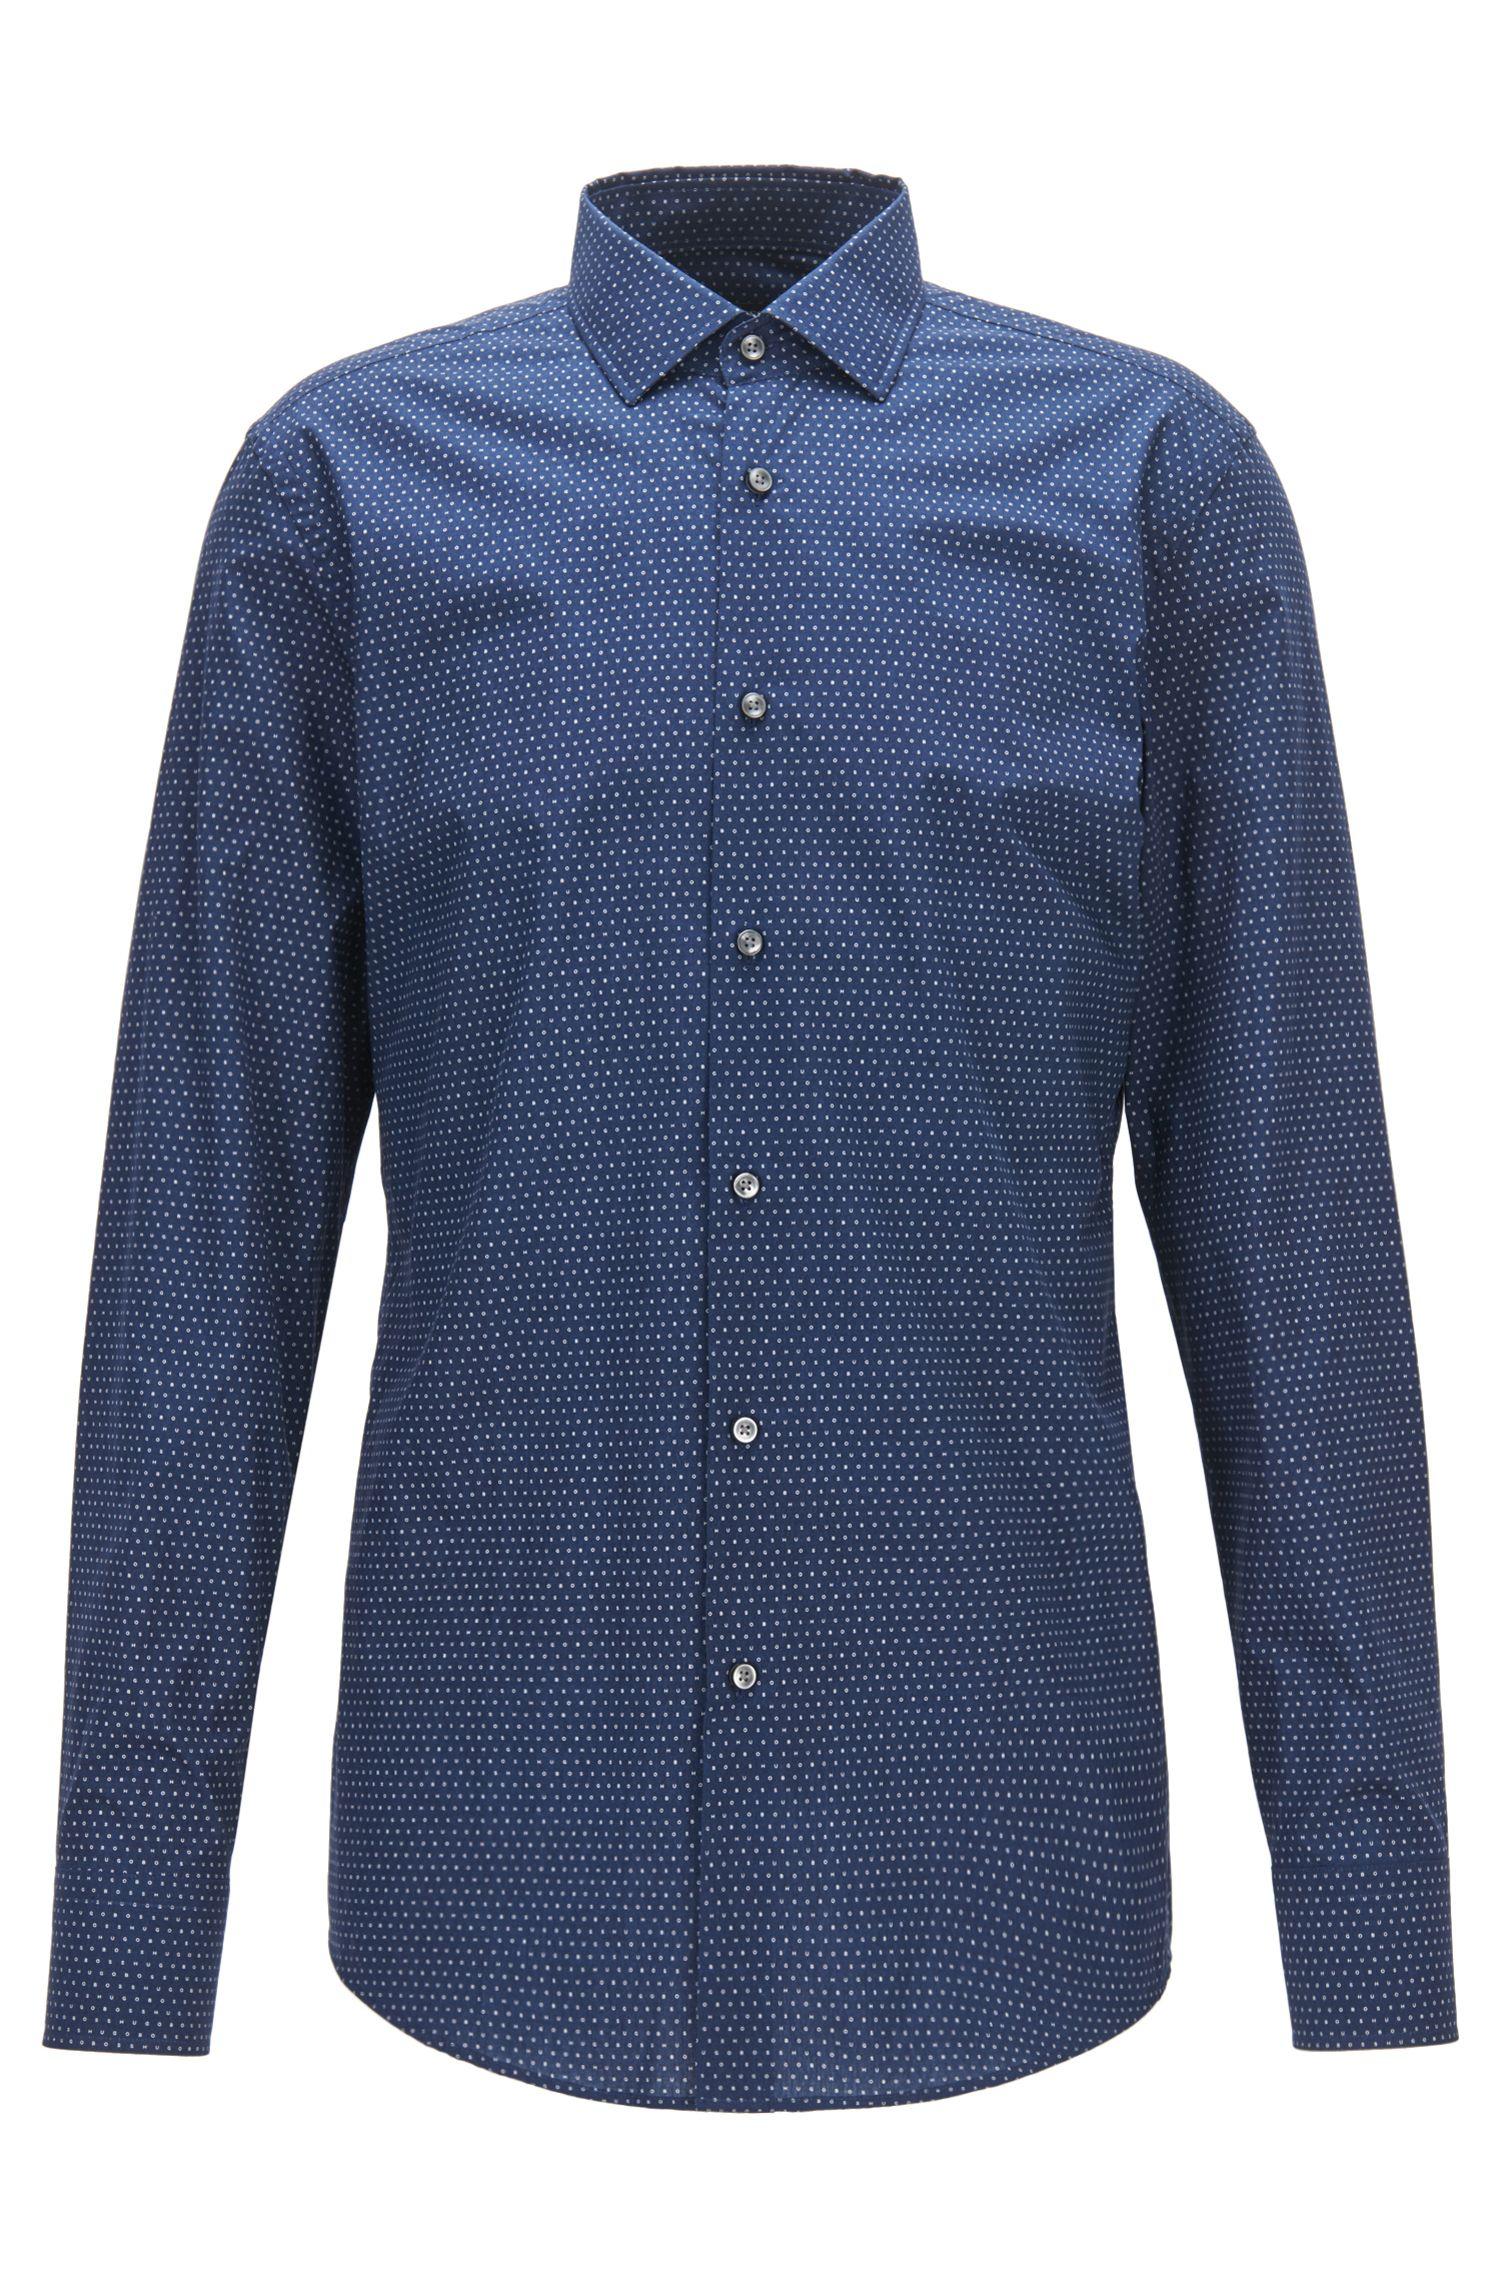 Dotted Cotton Dress Shirt, Slim Fit | Jenno